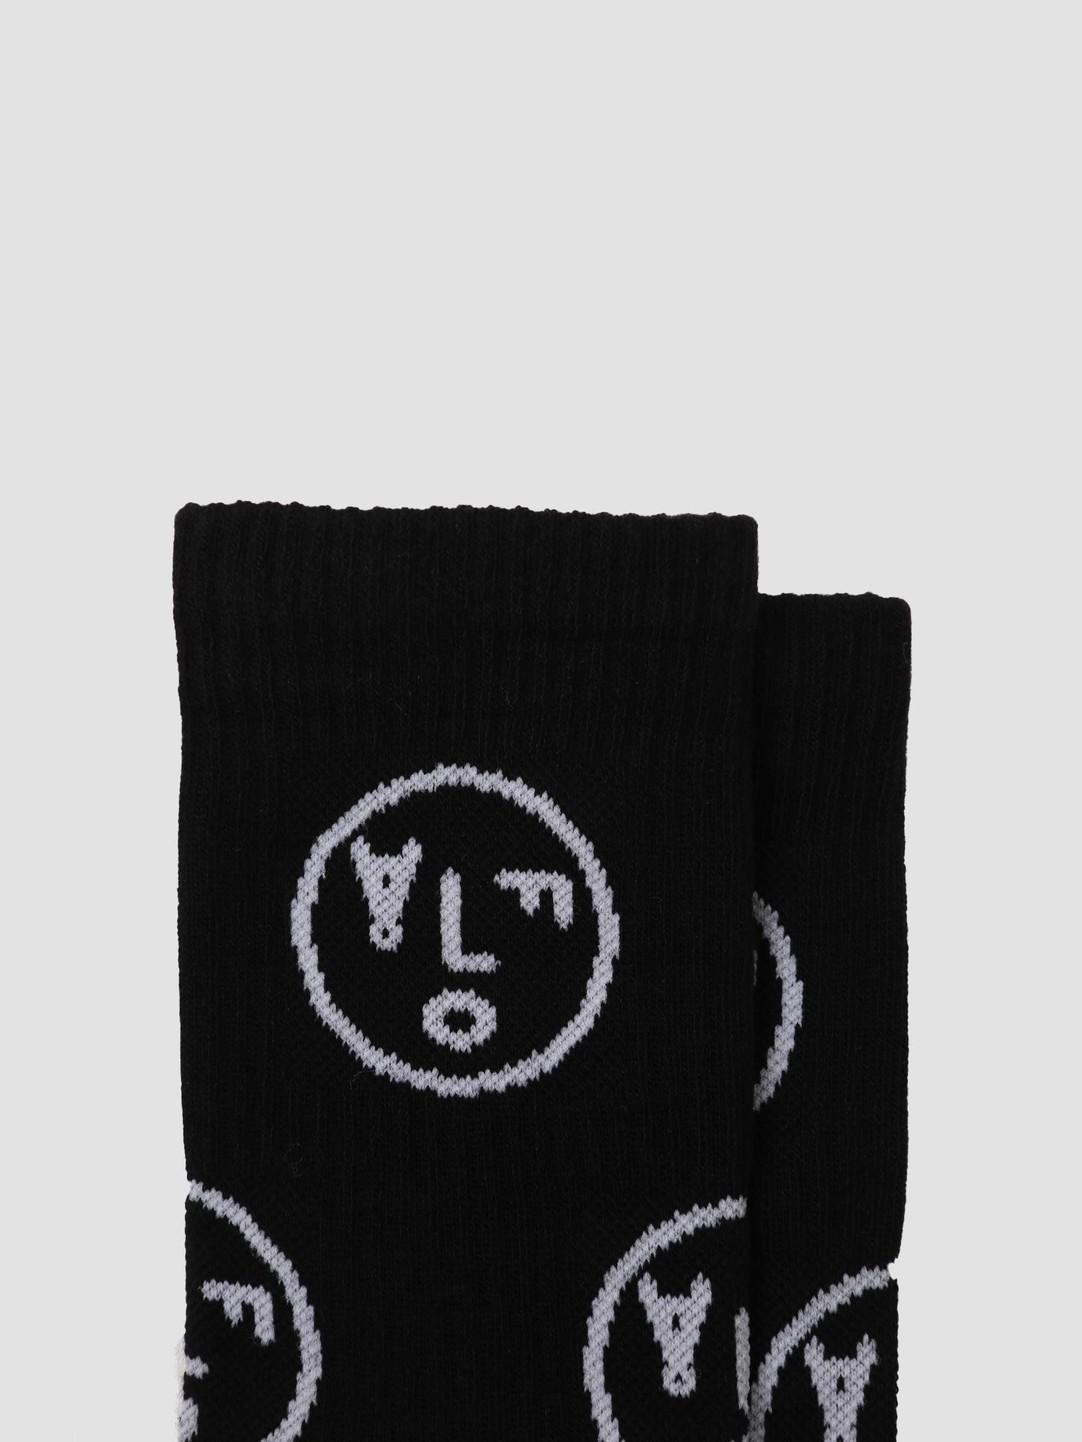 Olaf Hussein Olaf Hussein OH Face Socks Black